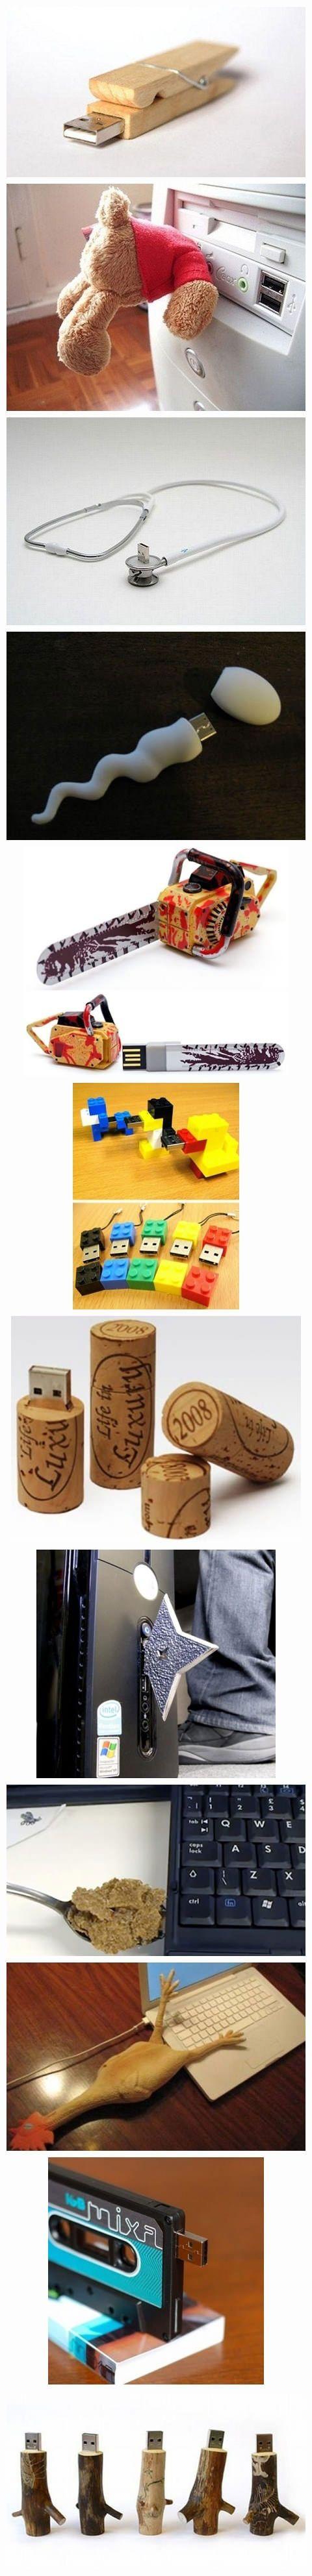 Creative USB flash drives - The Meta Picture